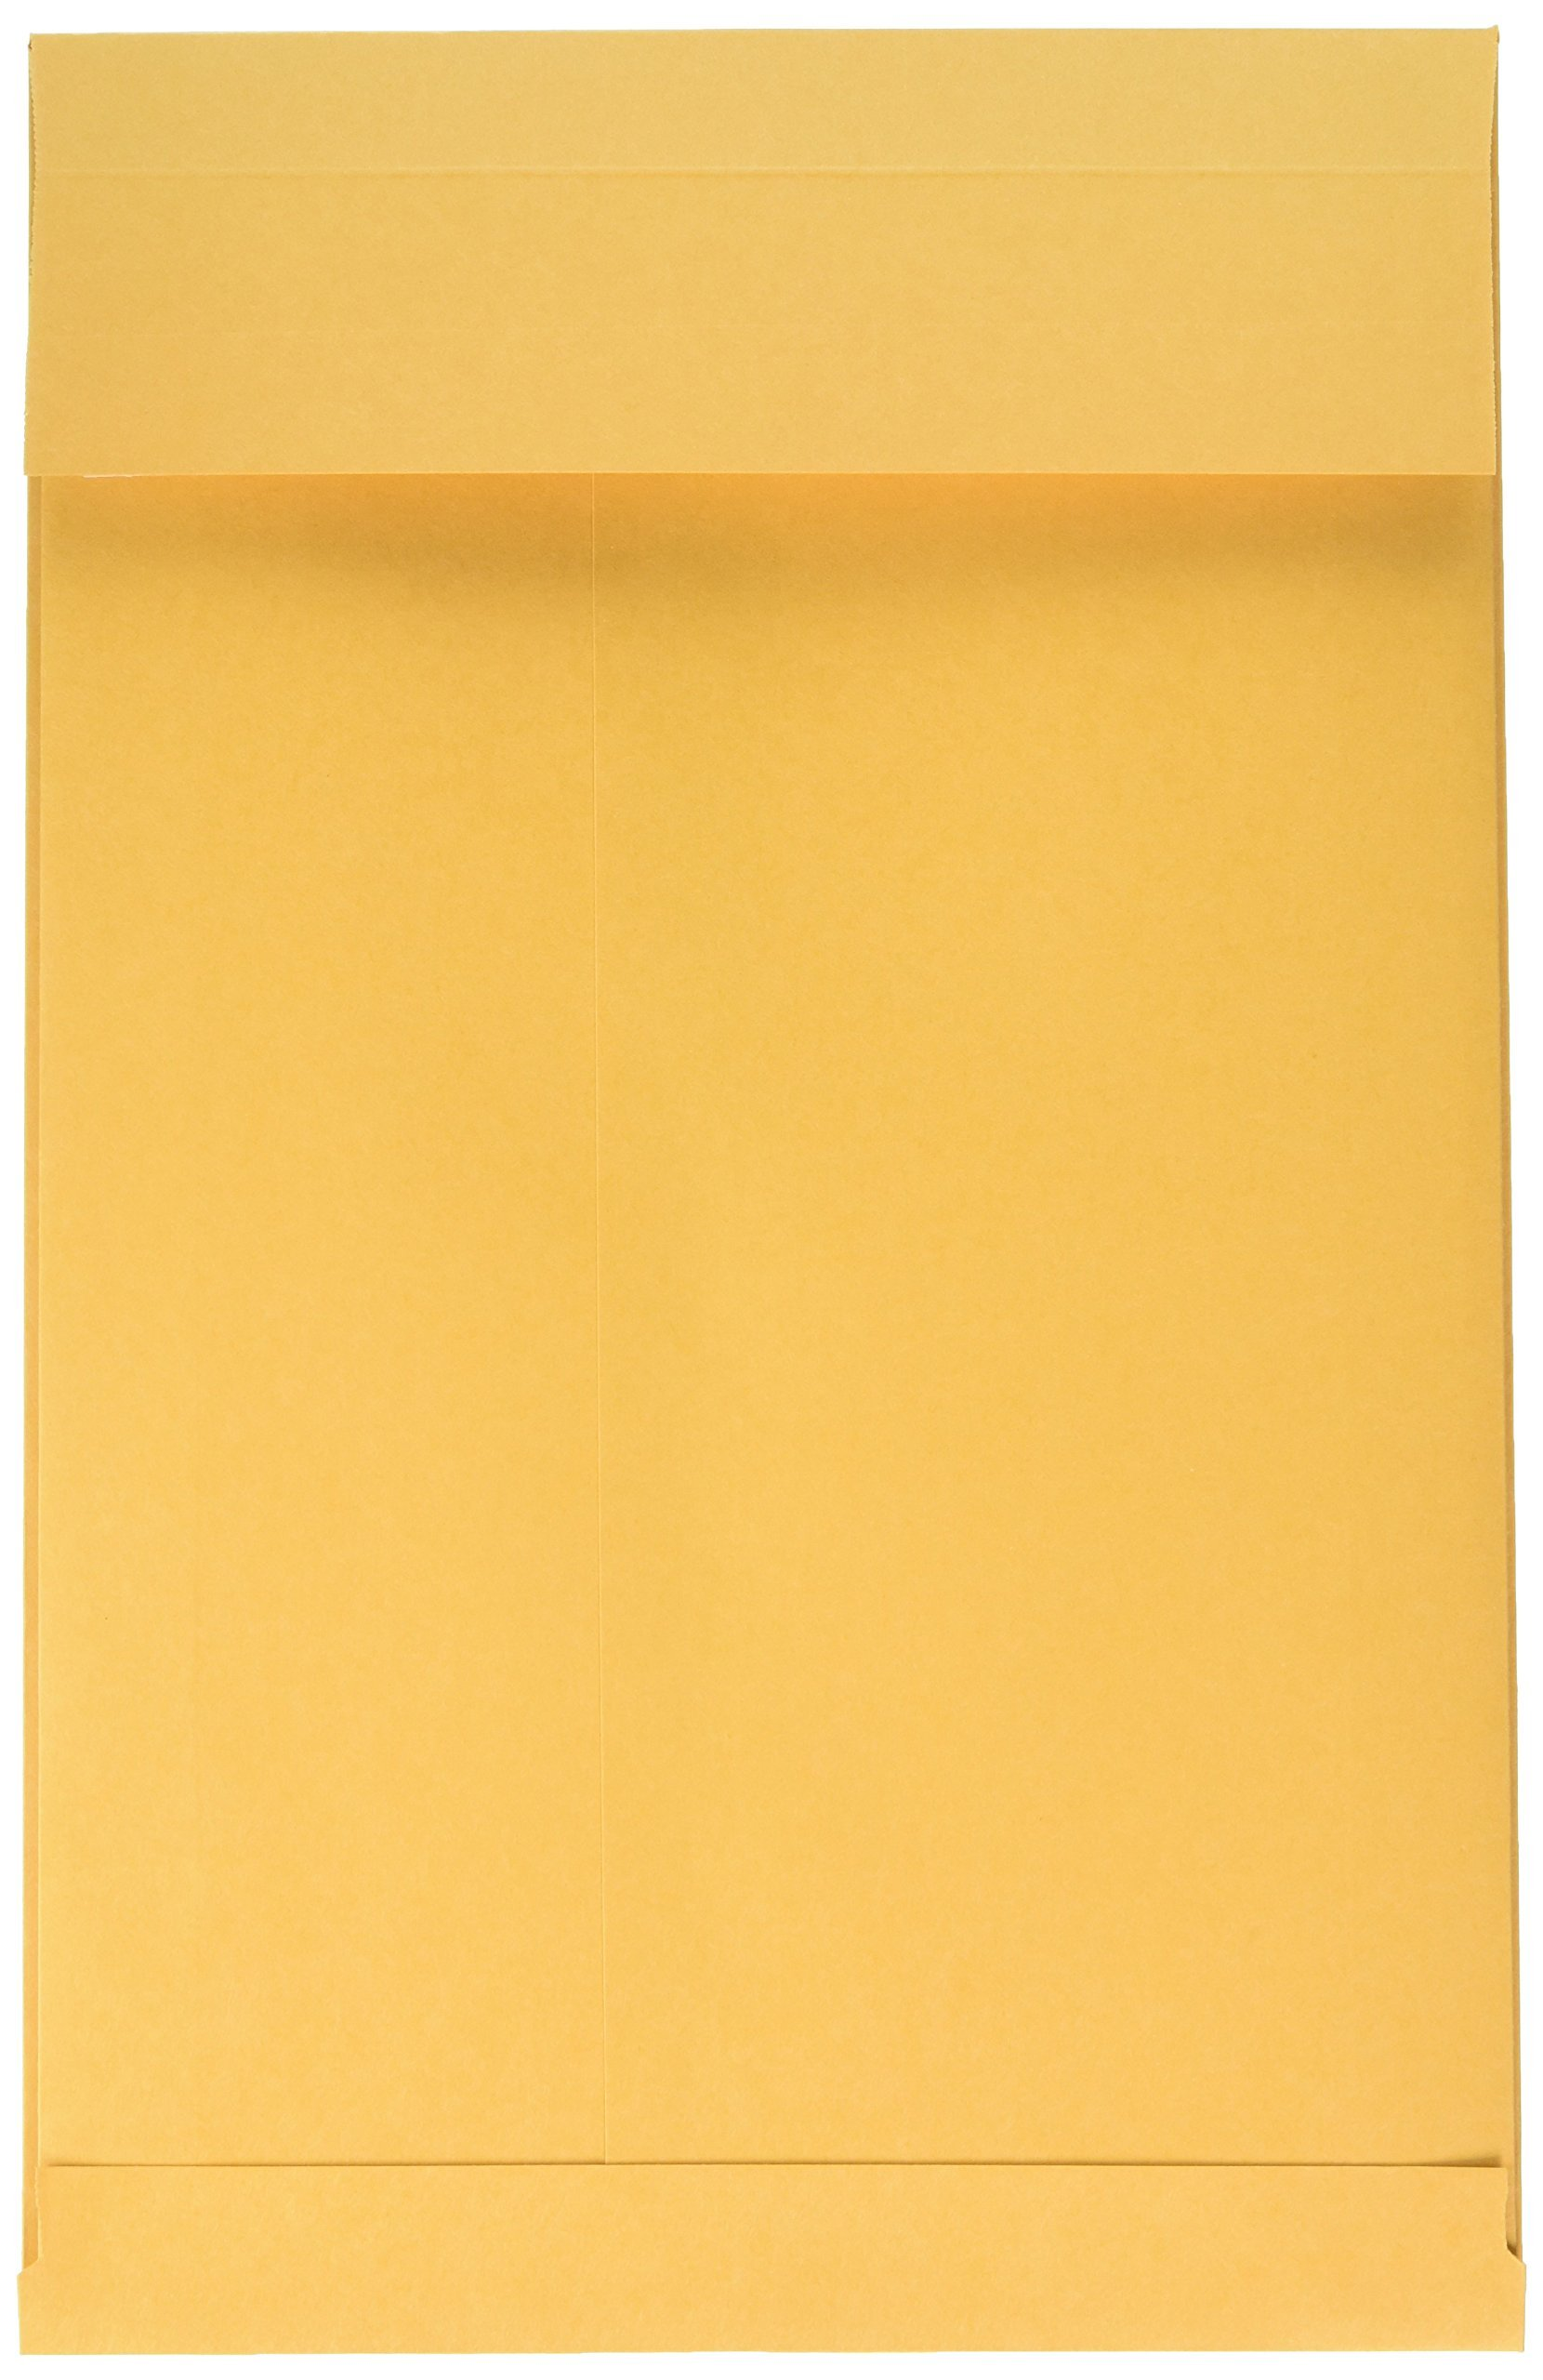 Quality Park Expansion Envelopes, Plain, 40 lbs, 9 x 12 x 2 Inches, 25 per Pack, Kraft (93334)